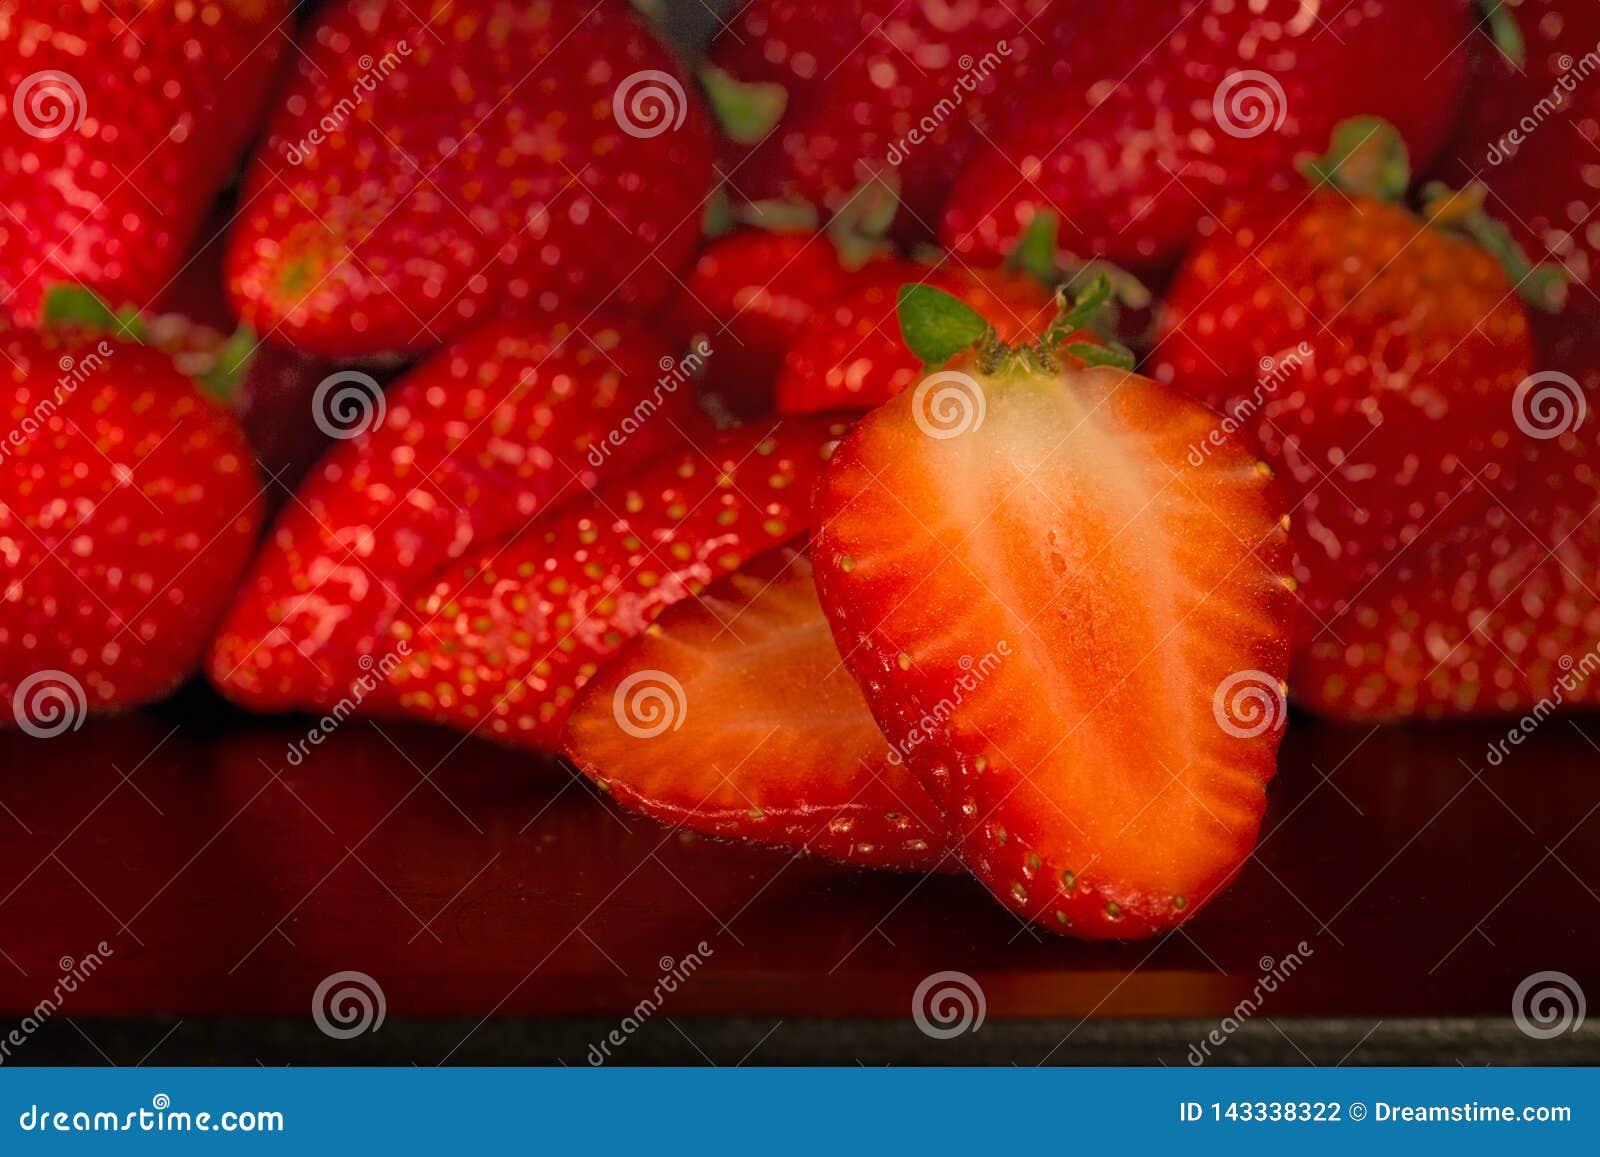 Muitos strawbarries na bandeja preta